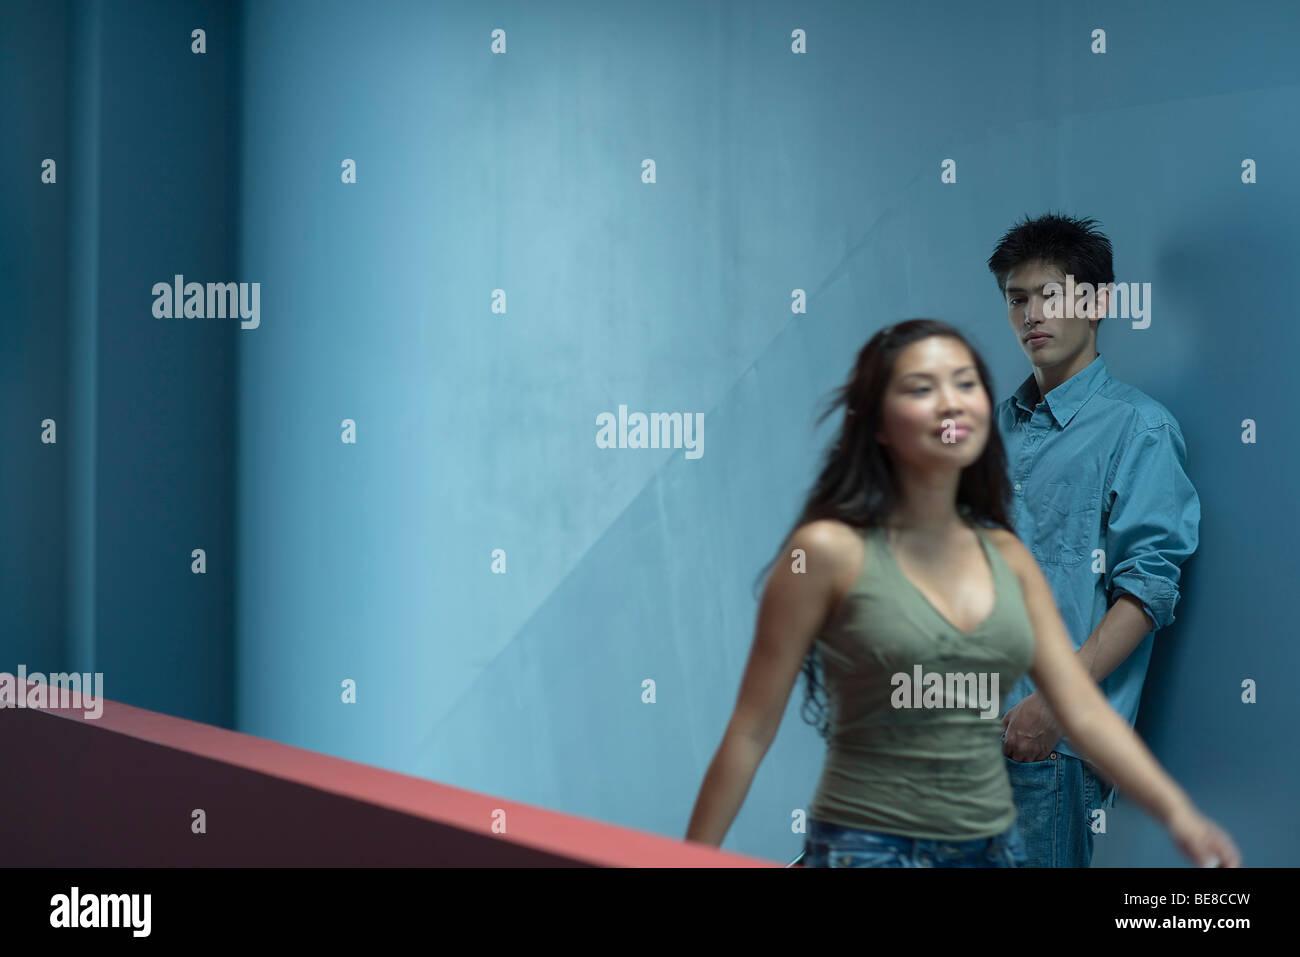 Young woman walking down corridor smiling, man watching as she walks by - Stock Image